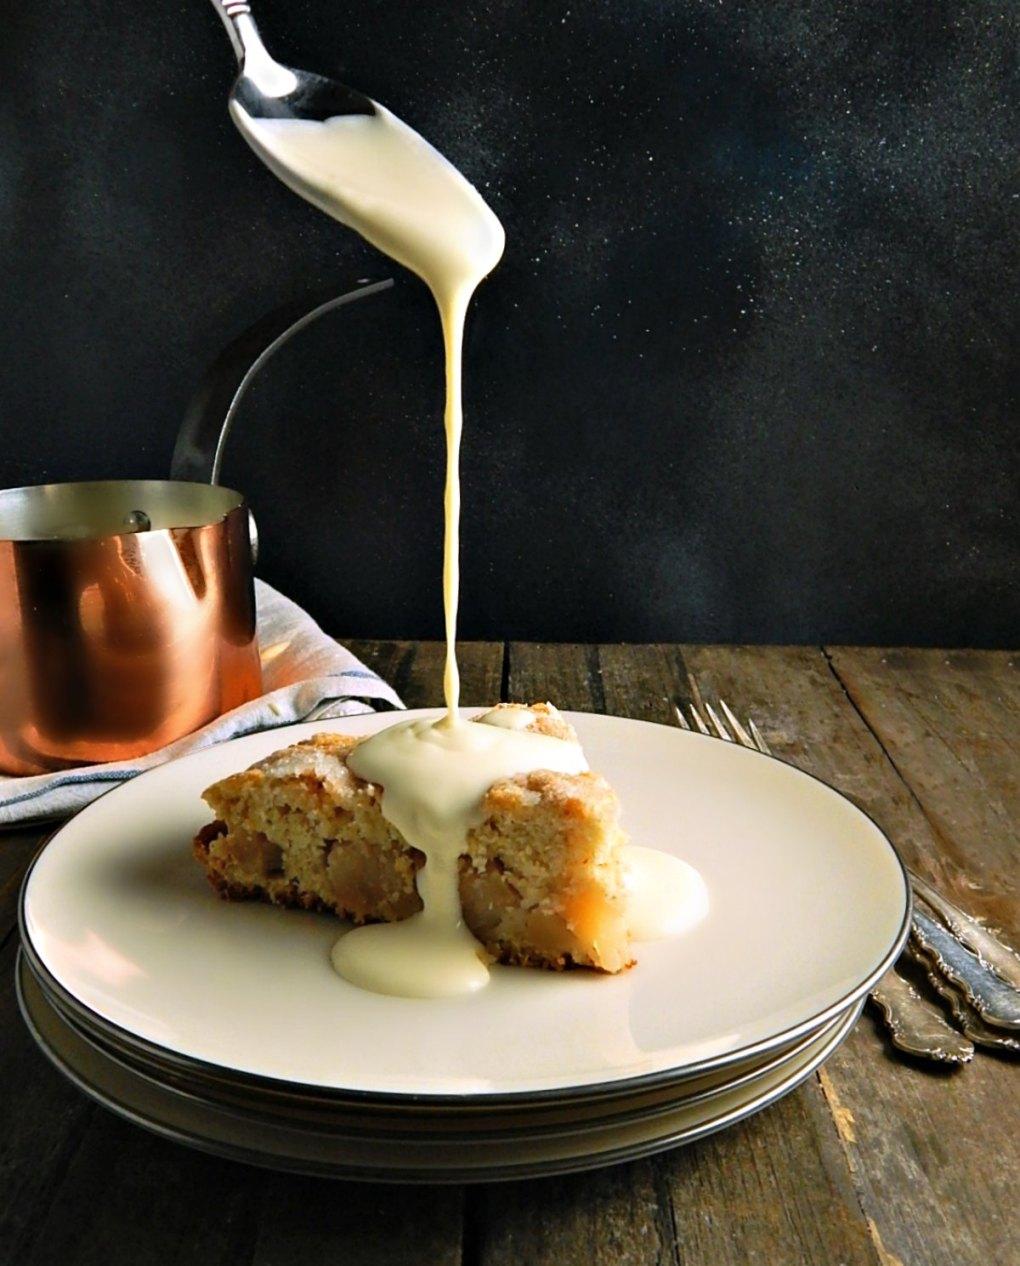 Irish Apple Pie Cake with Custard Sauce - Creme Anglaise